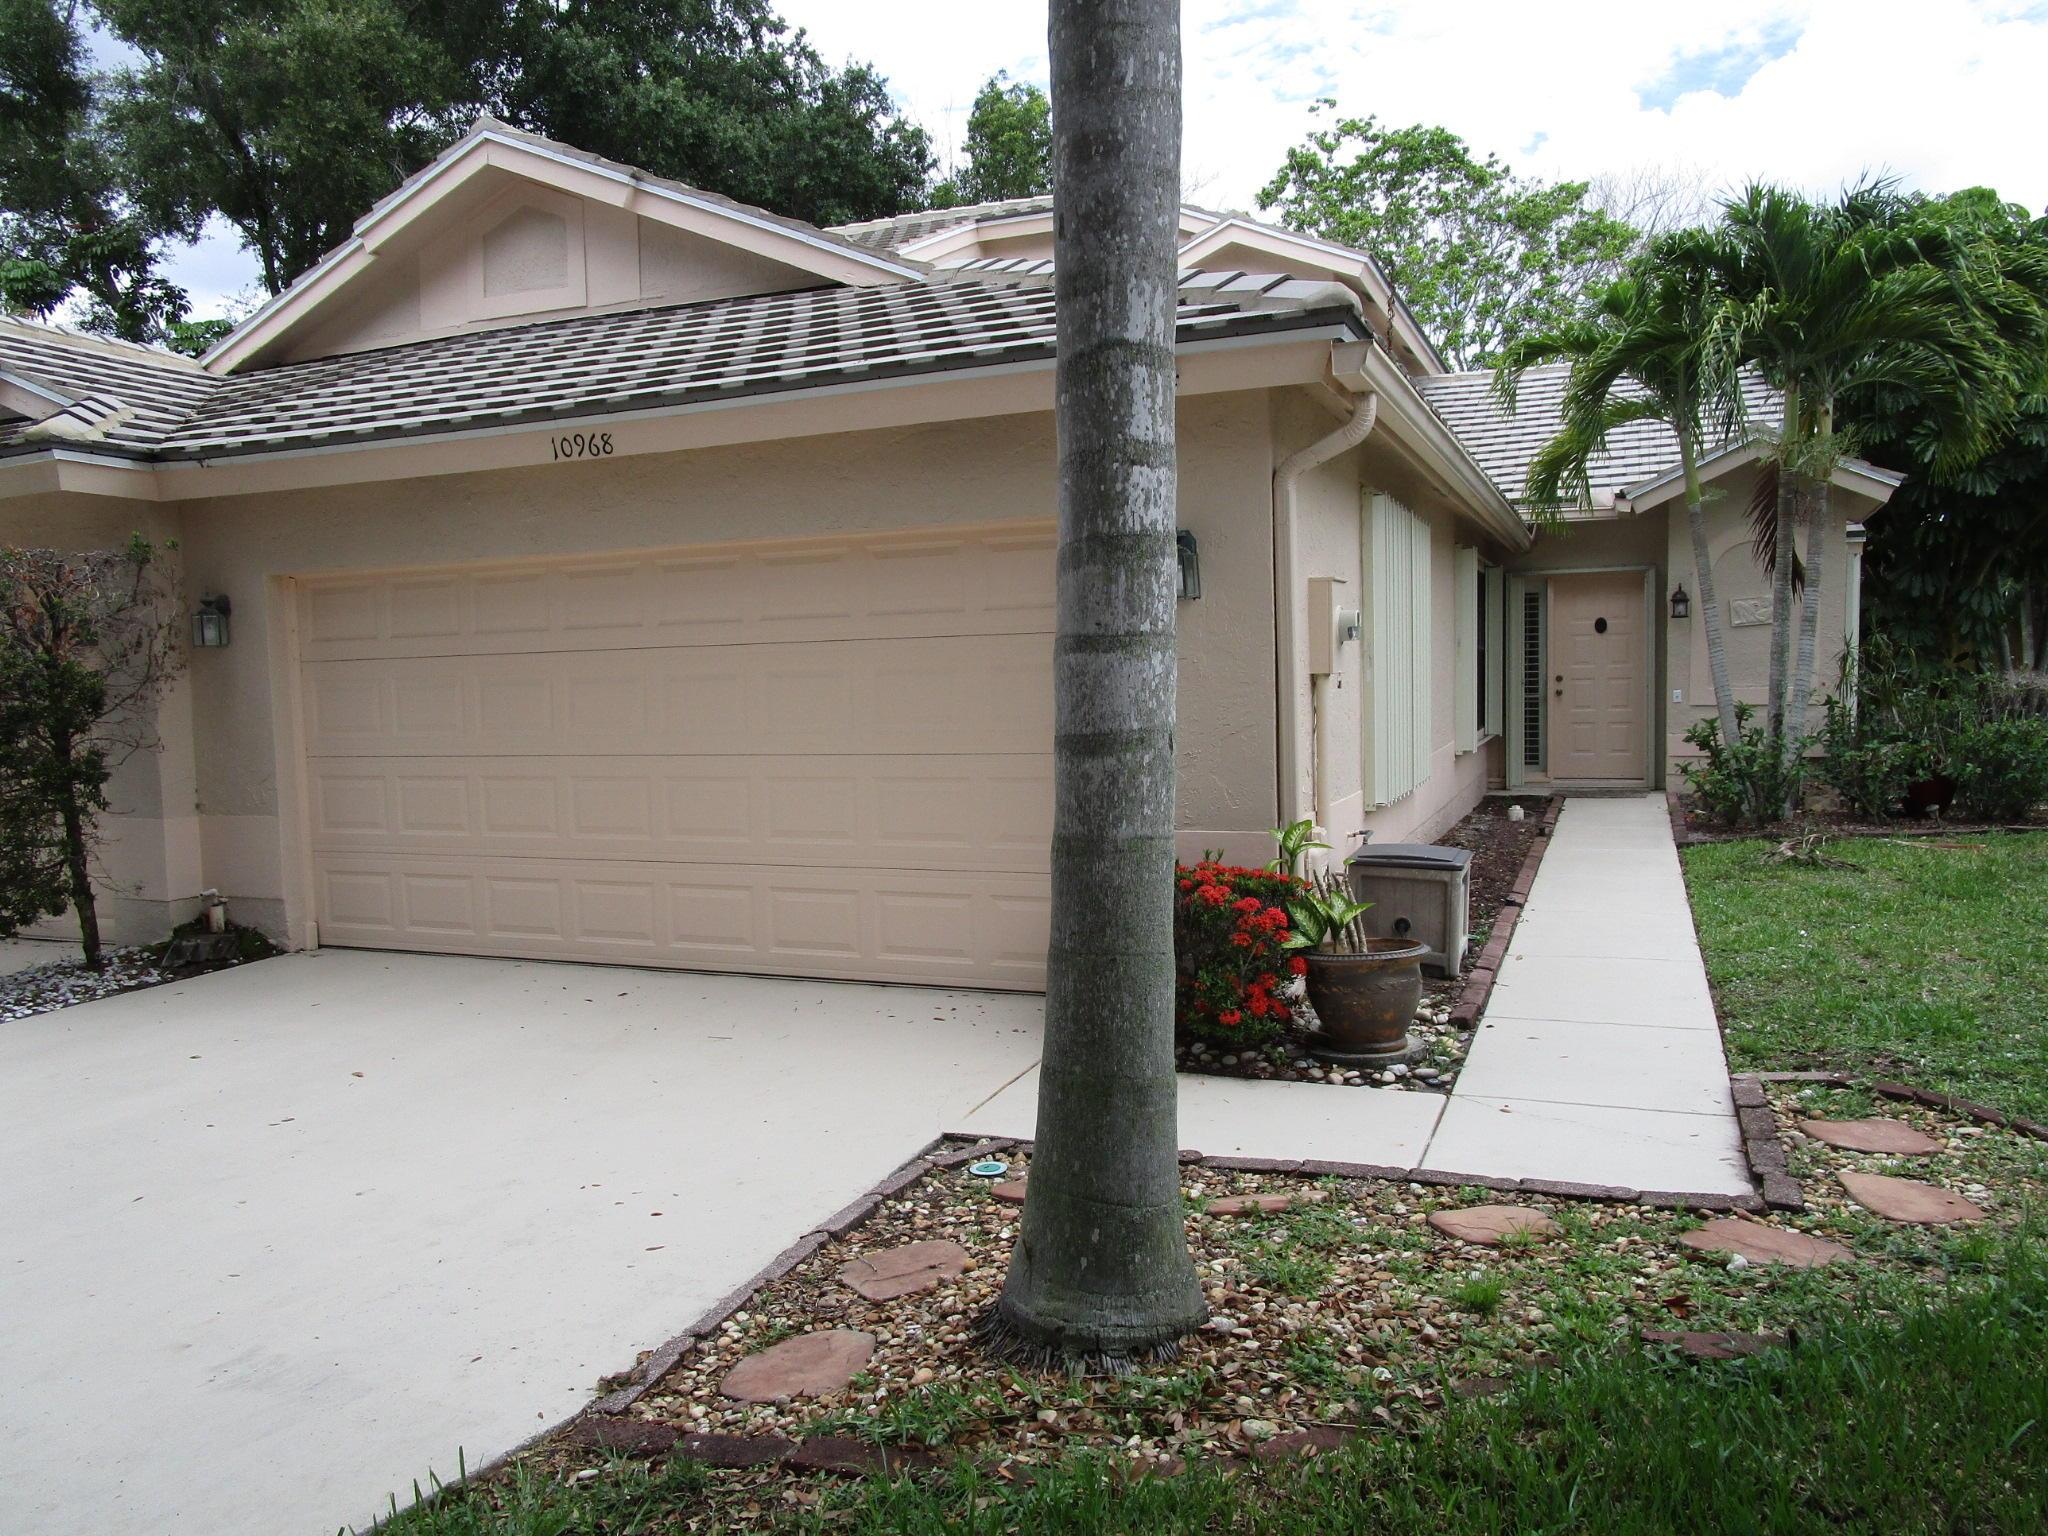 10968 Stafford Circle Boynton Beach, FL 33436